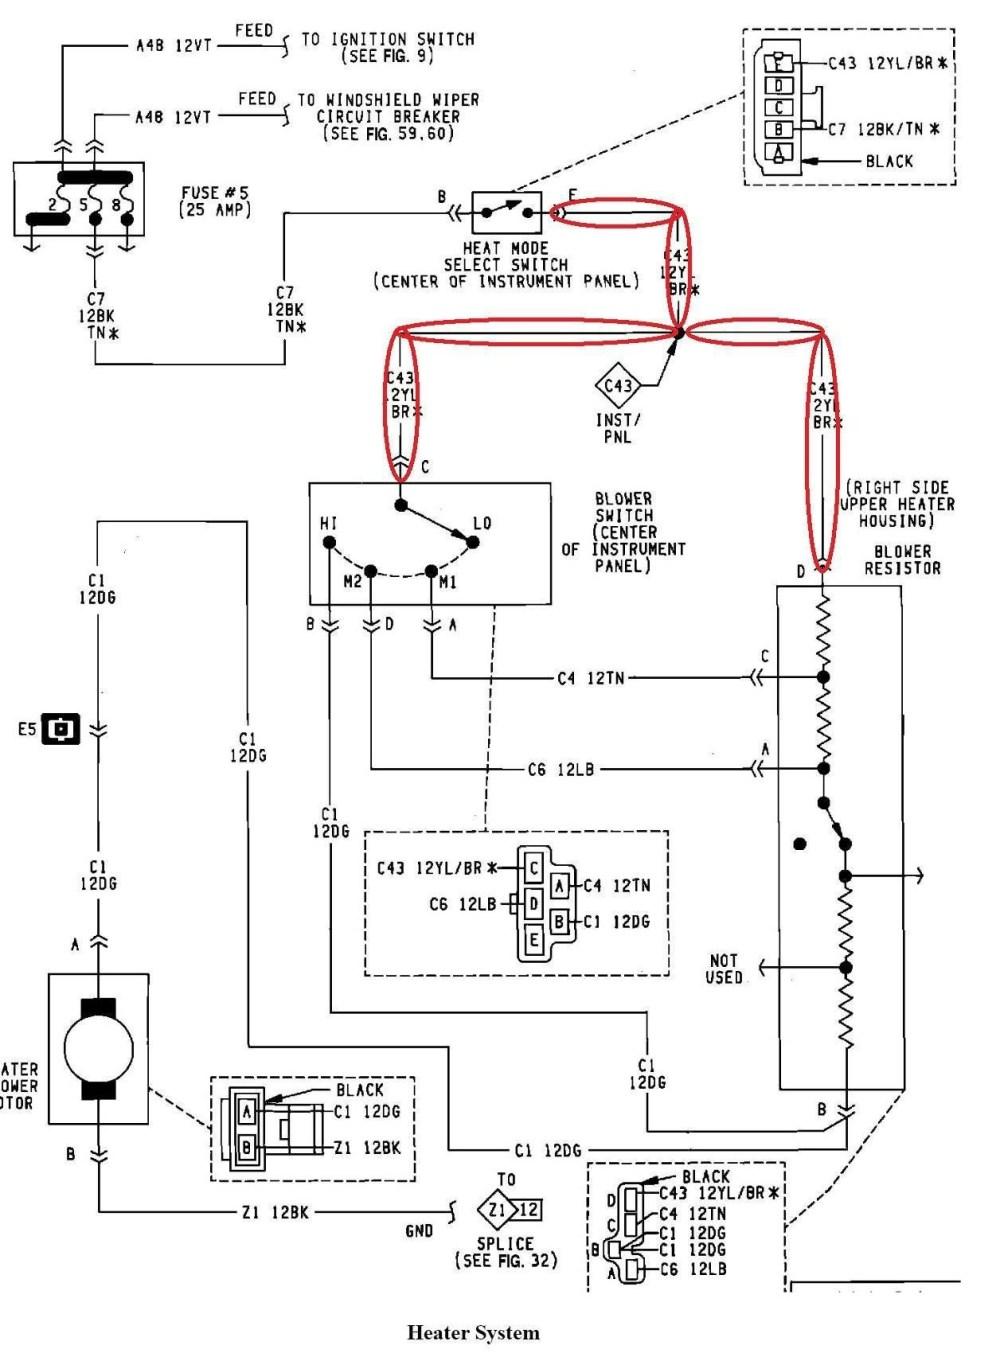 medium resolution of st 480 wiring diagram wiring diagram for youst 480 wiring diagram wiring diagram repair guides 99